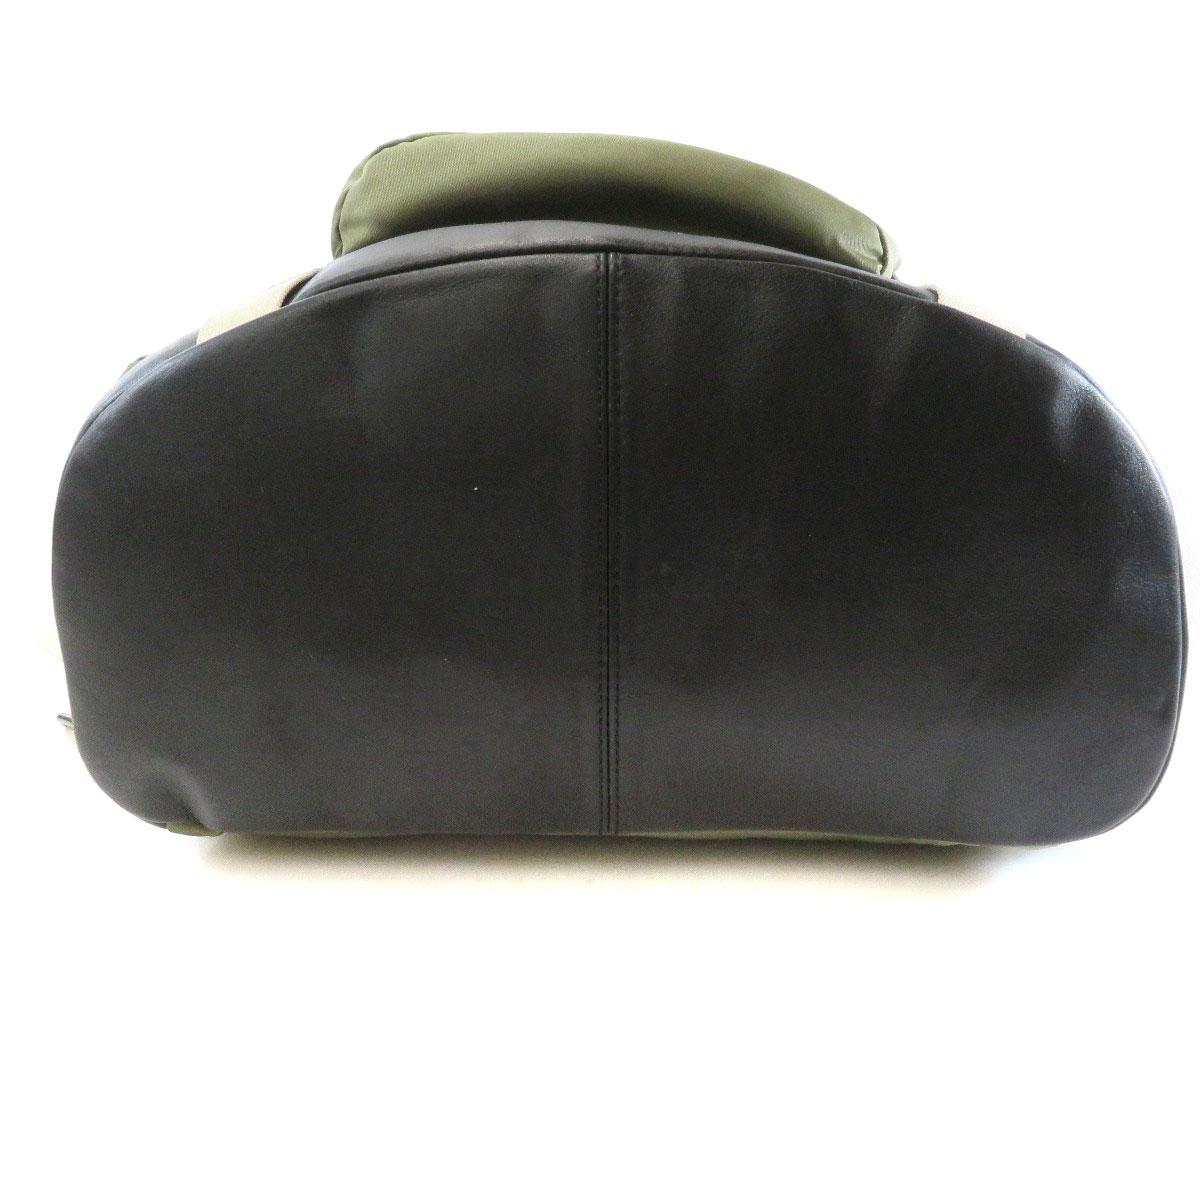 COACH F71884帆布背包·日包尼龙材料/皮革女士